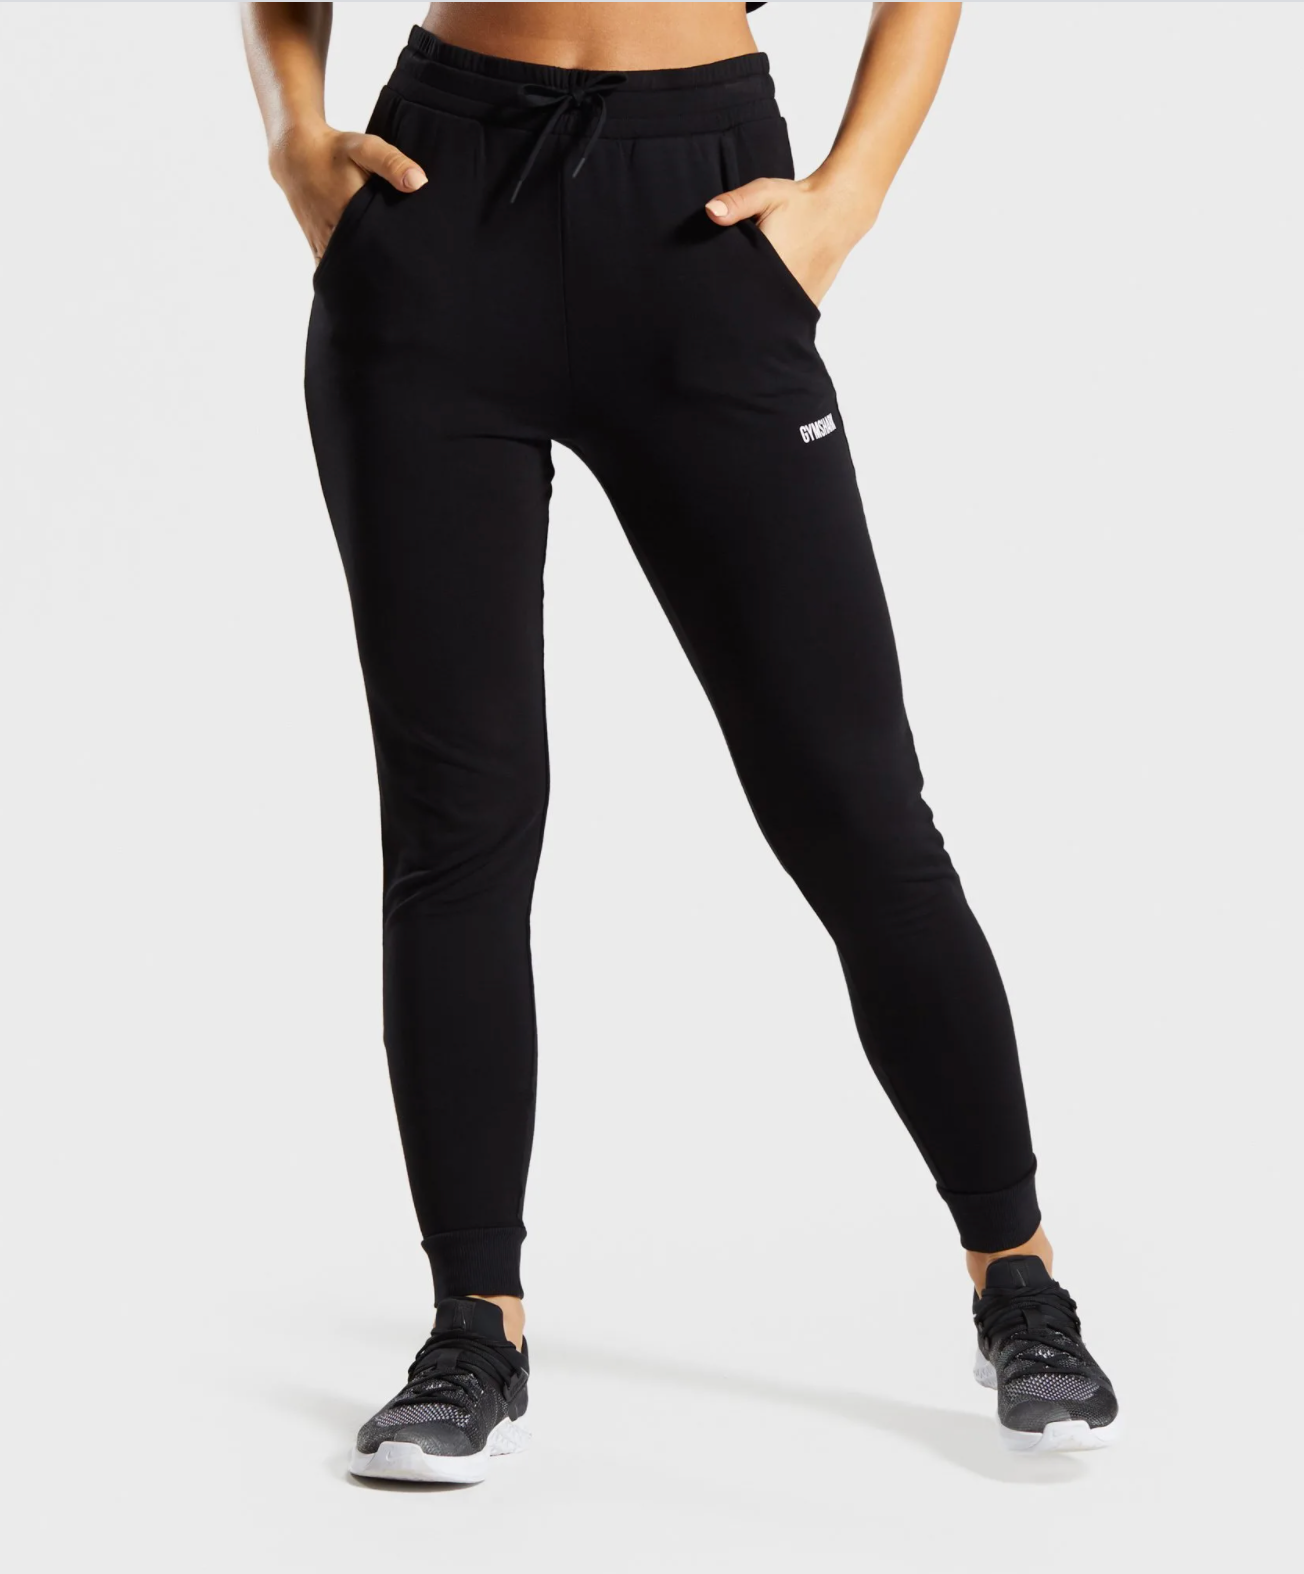 Gymshark Pippa training Joggers in Black